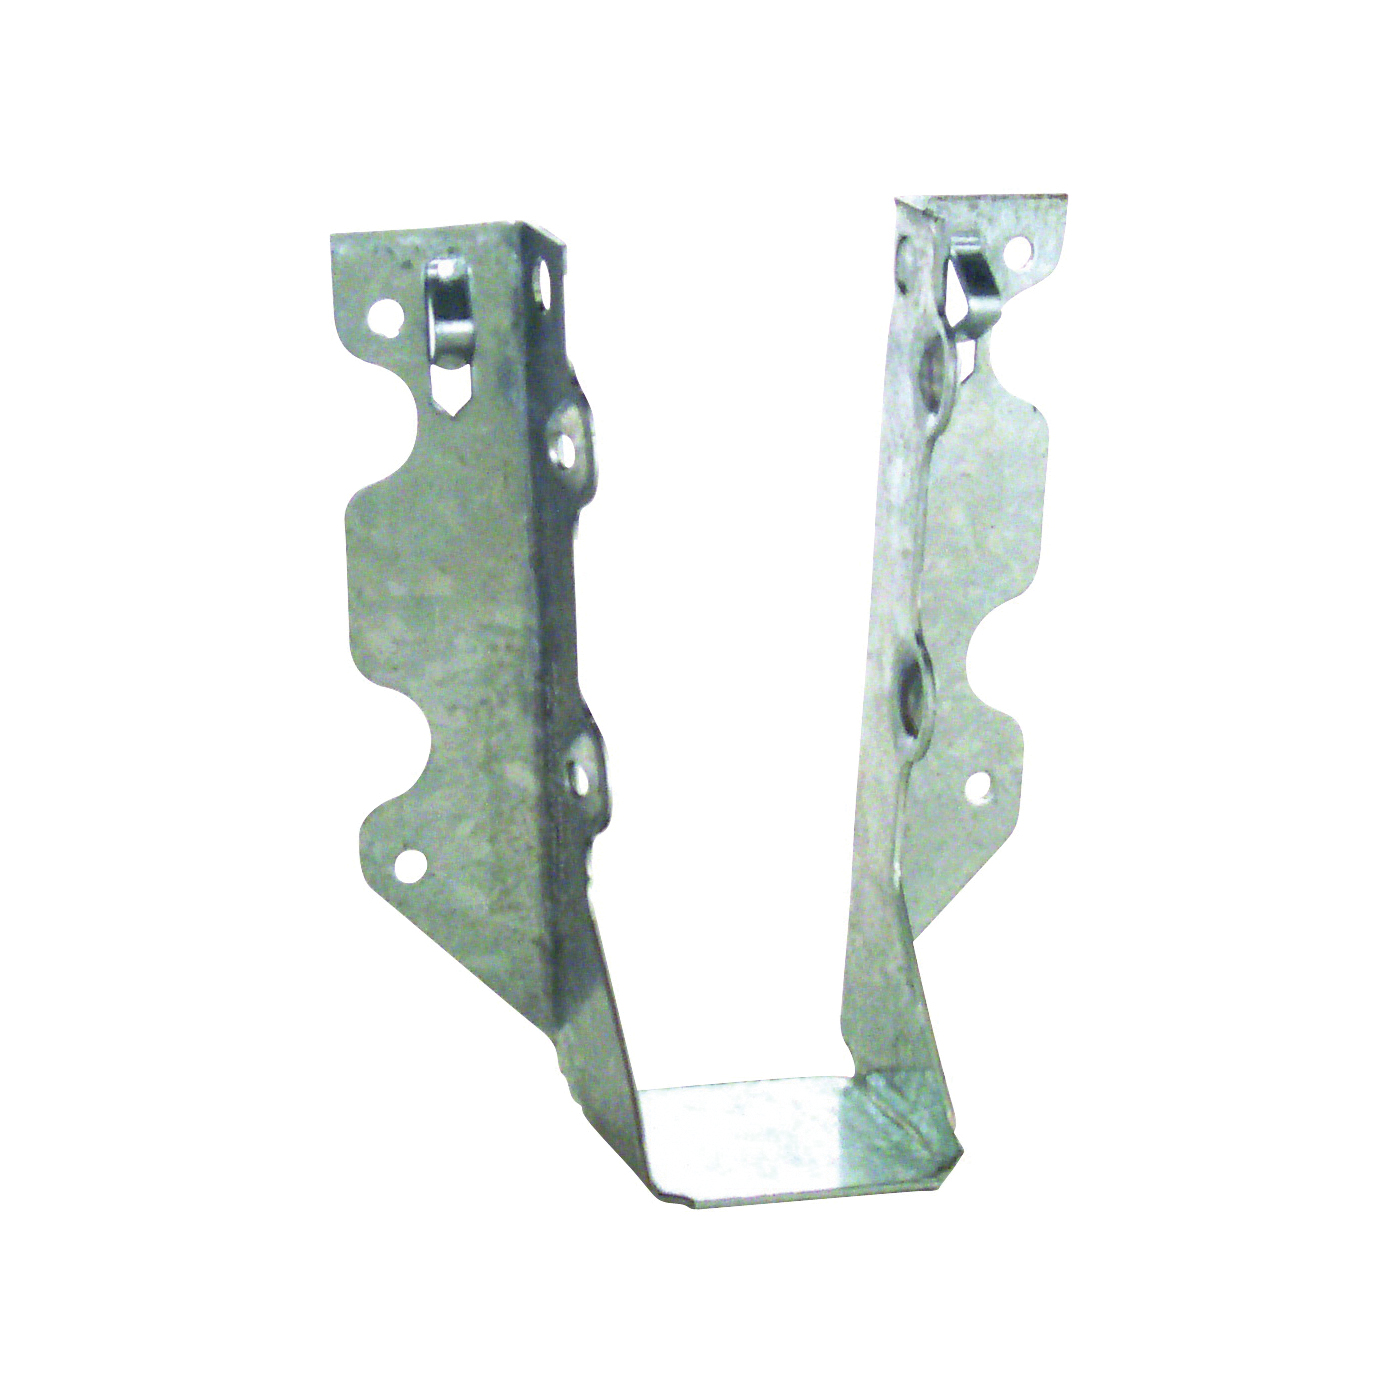 Picture of MiTek JUS26 Slant Joist Hanger, 4-13/16 in H, 1-3/4 in D, 1-9/16 in W, 2 in L x 6 to 8 in H, Steel, Galvanized